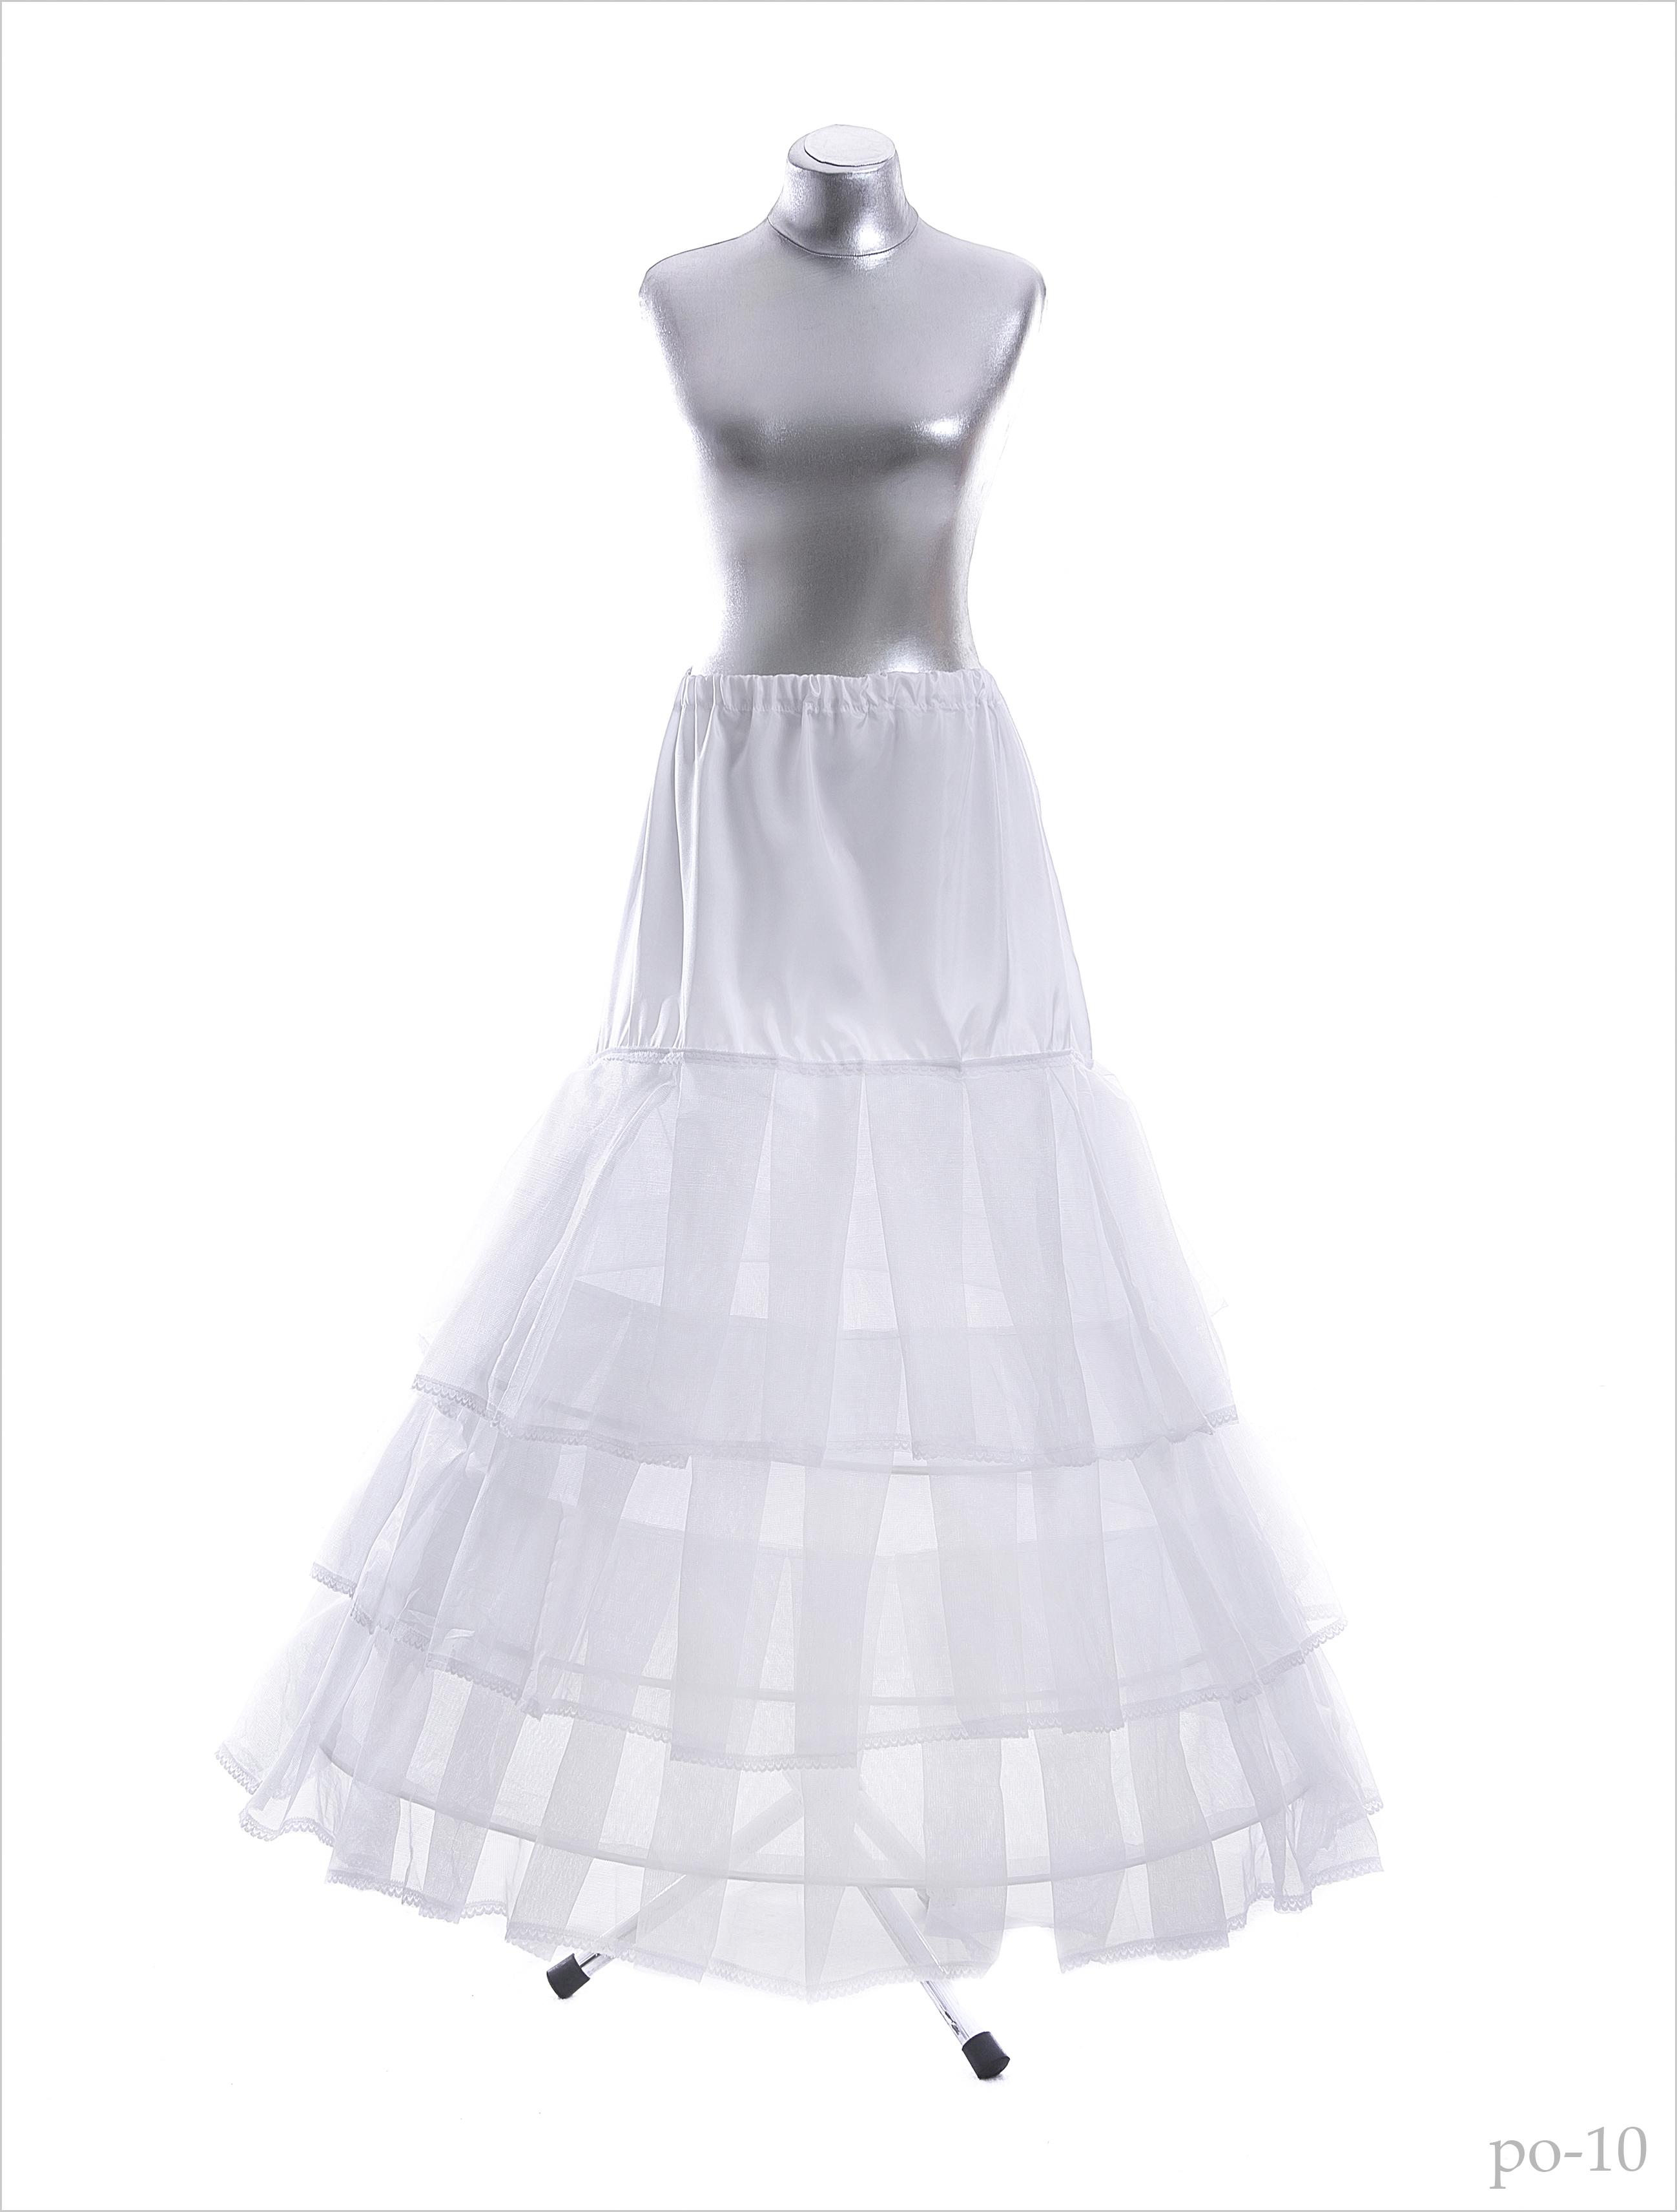 Underskirt for a wedding dress po-10